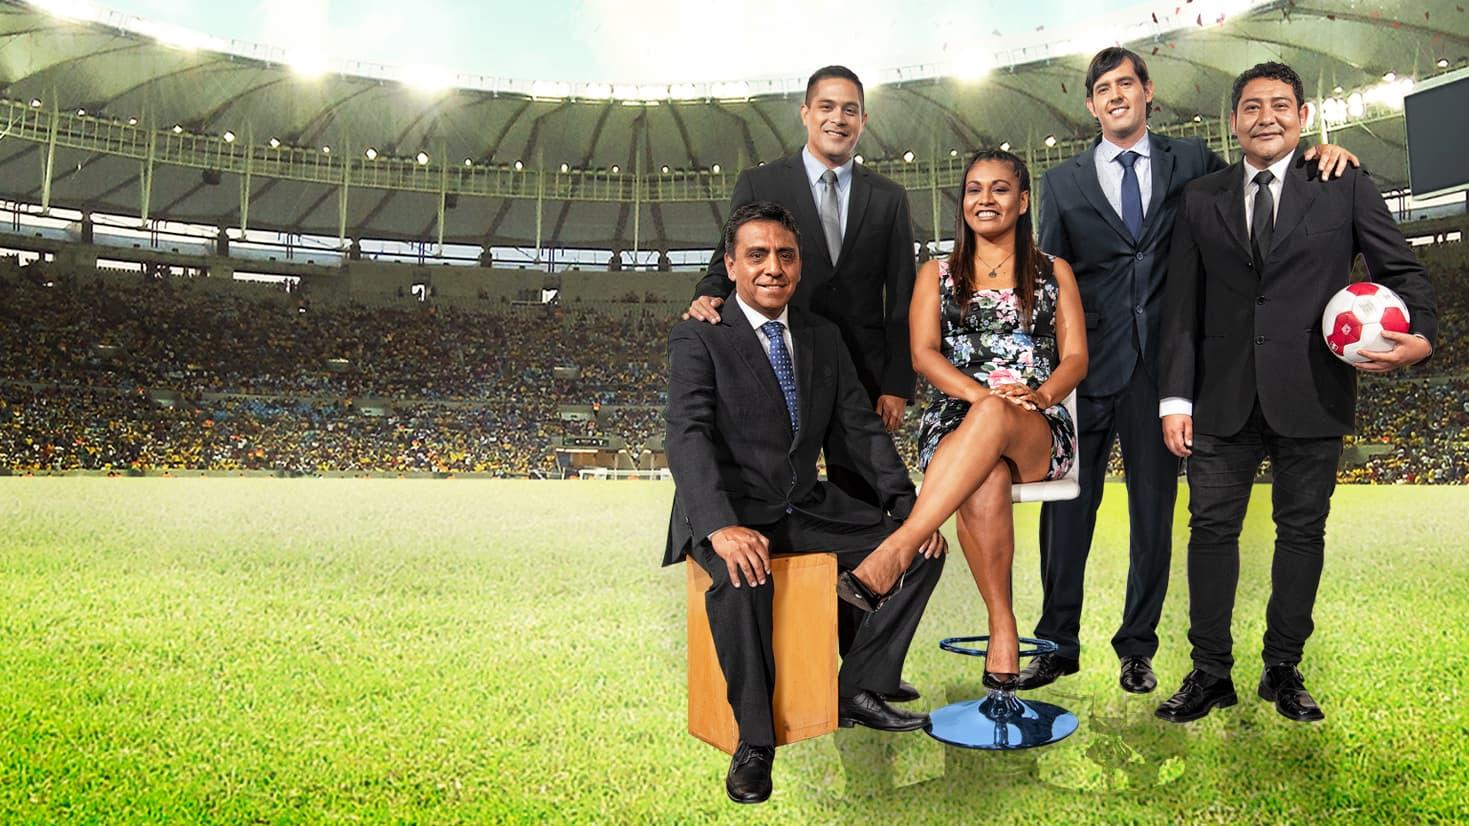 ¿Raúl Ruidiaz merece ser titular ante Colombia? - Líbero Tv